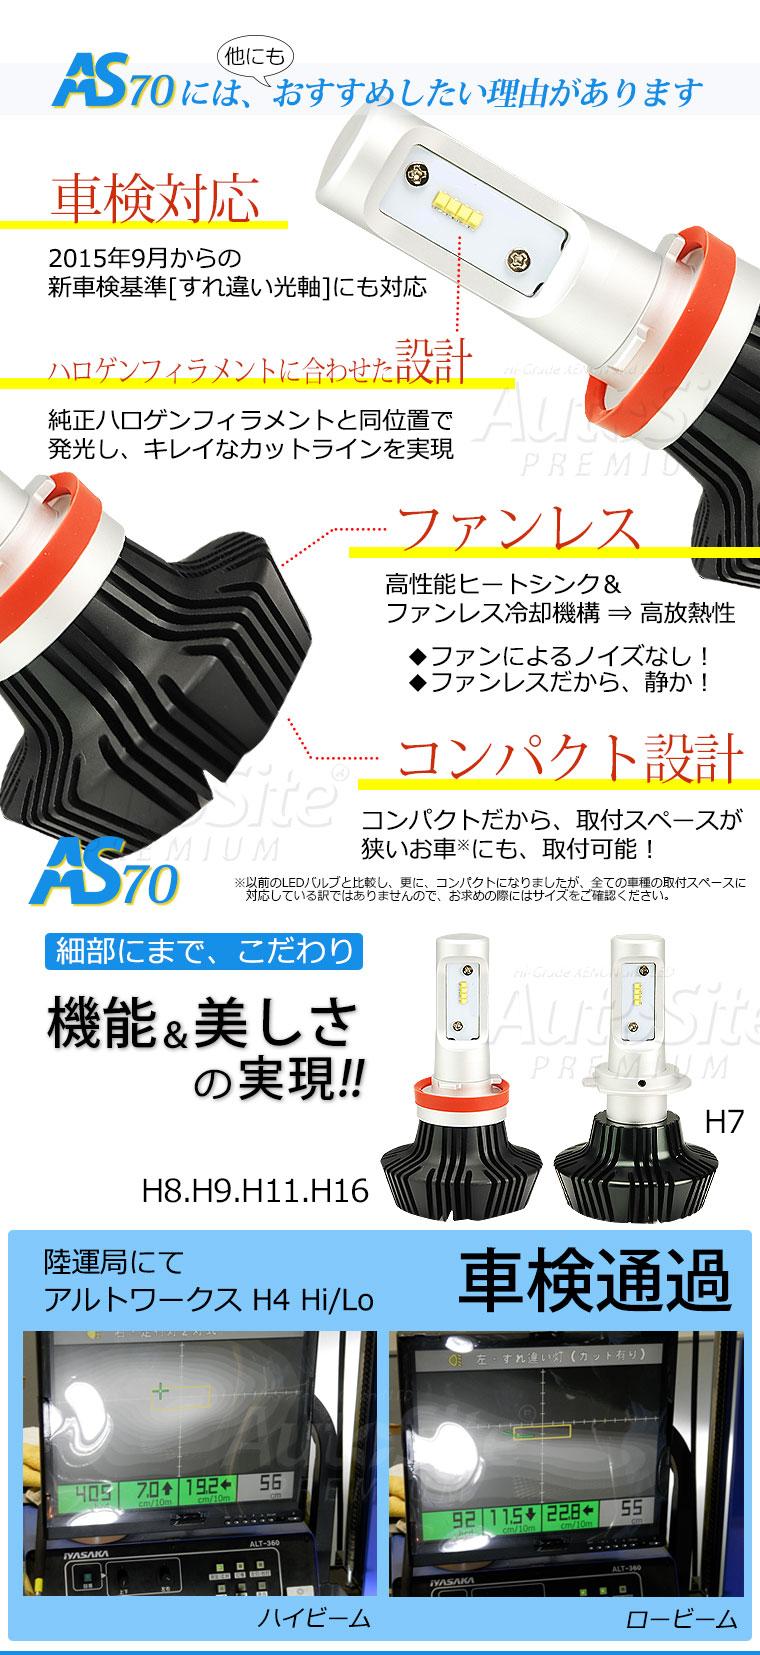 AutoSite LED ヘッドライト フォルランプ